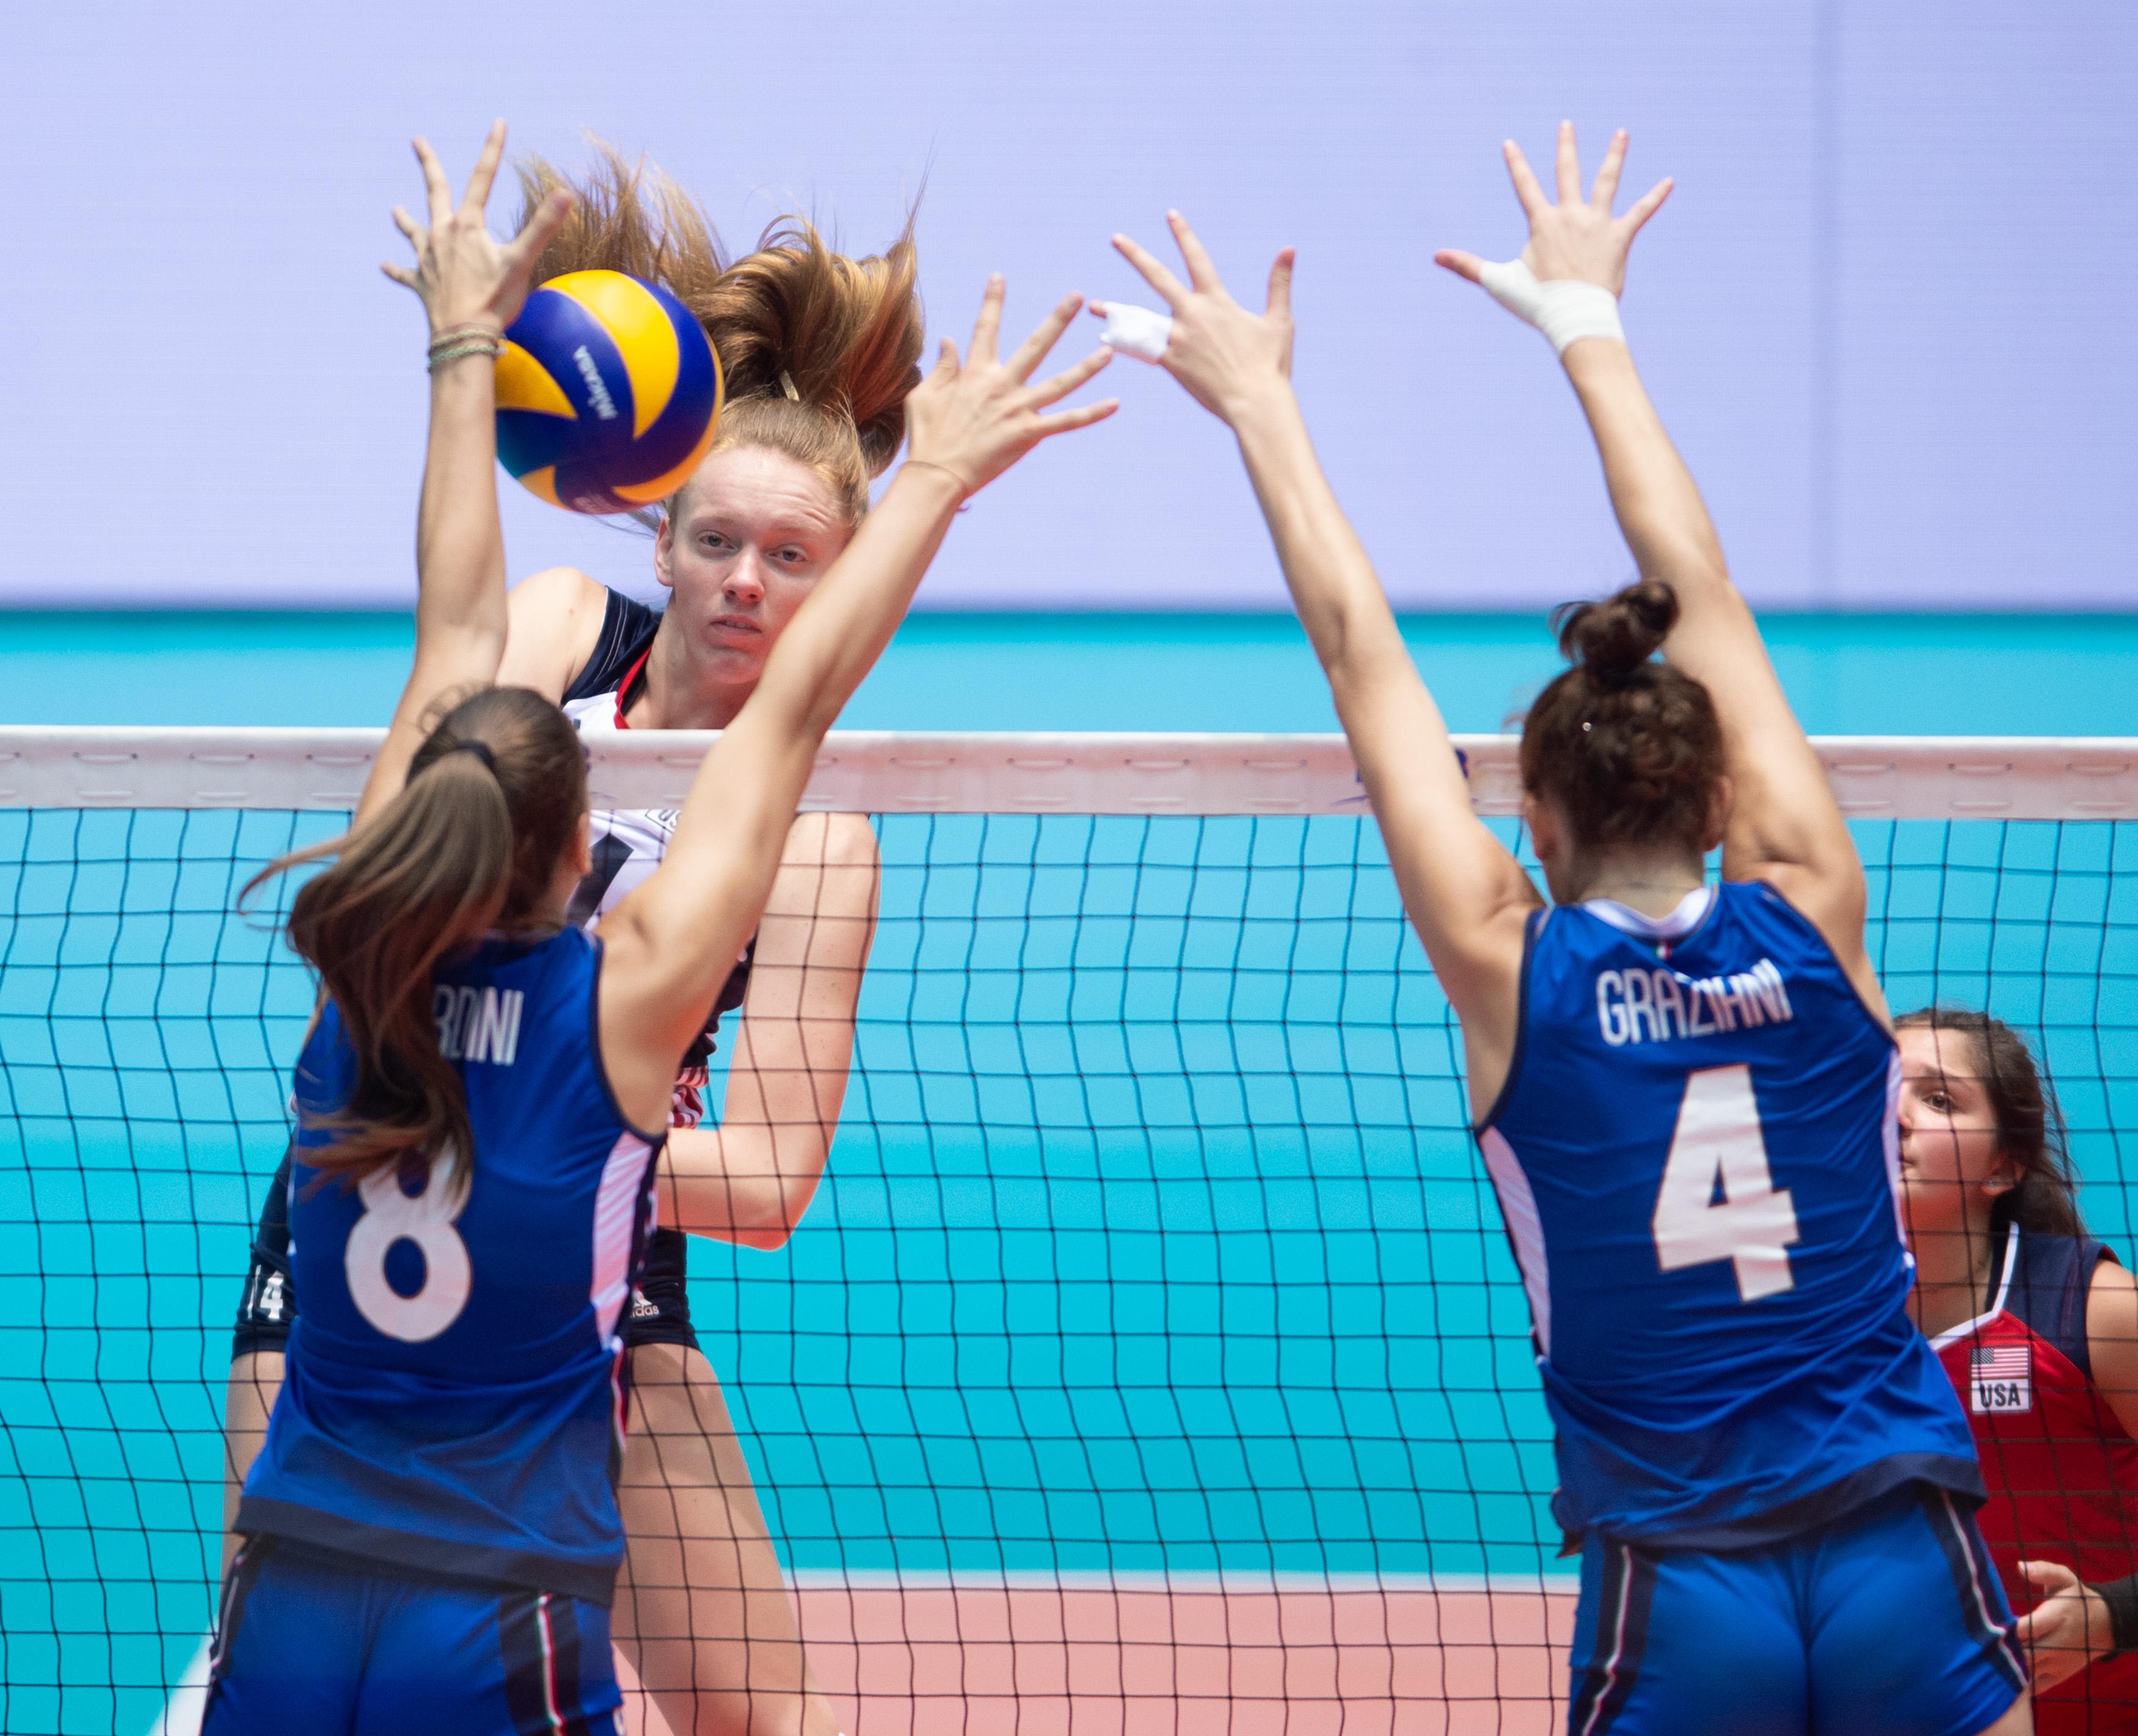 News - Phenomenal USA grab elusive Girls' U18 Worlds gold with epic Italy win